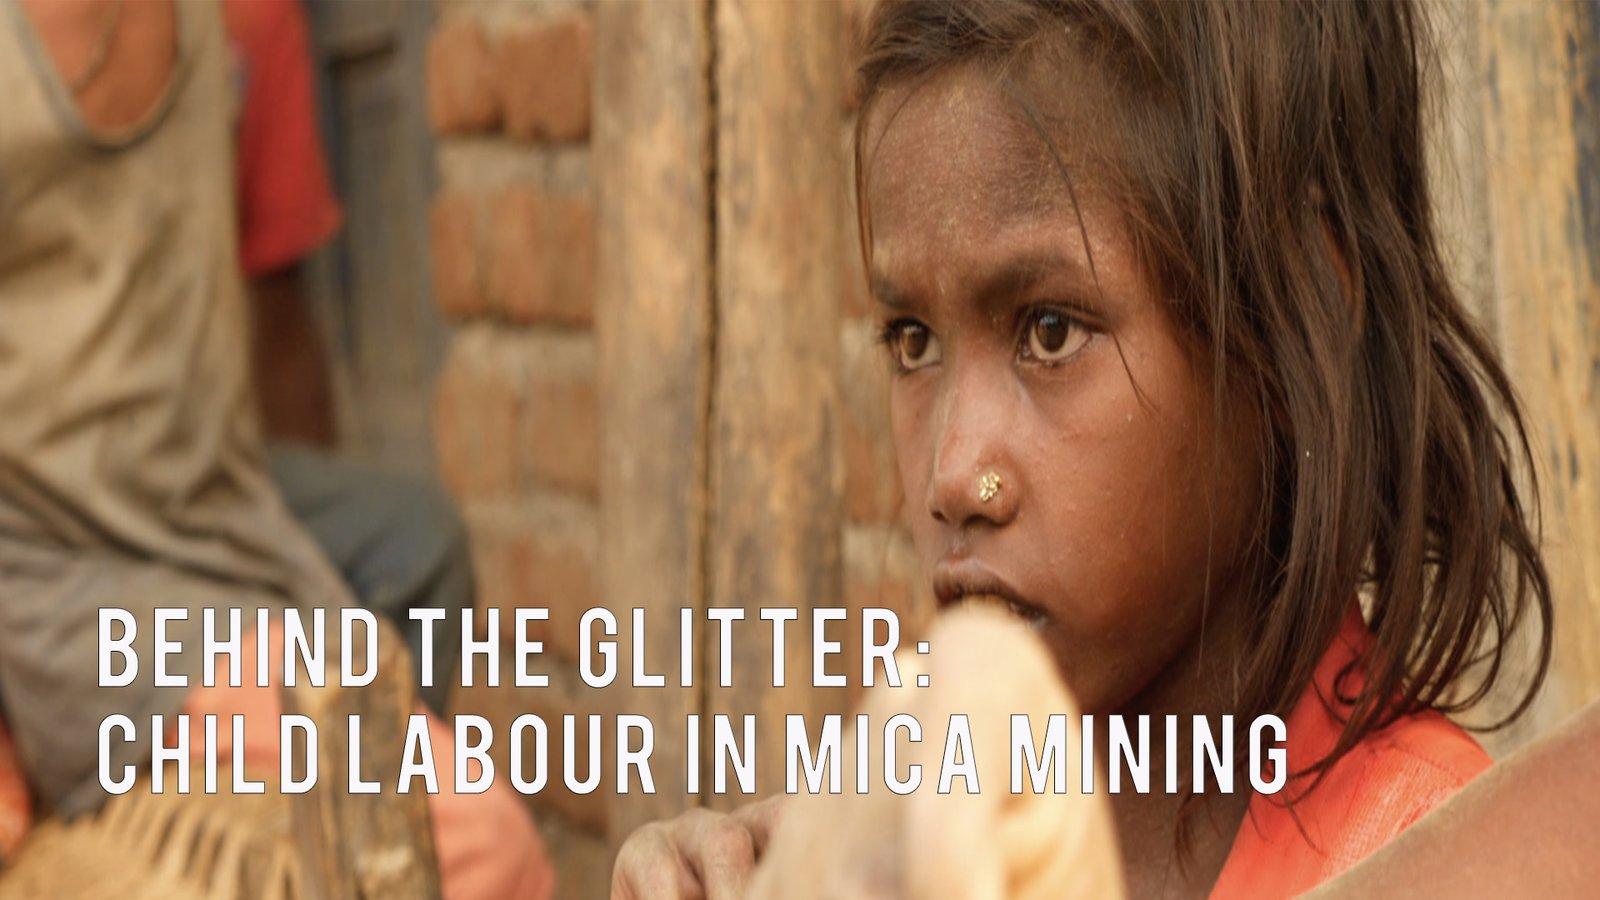 Beyond the Glitter: Mica